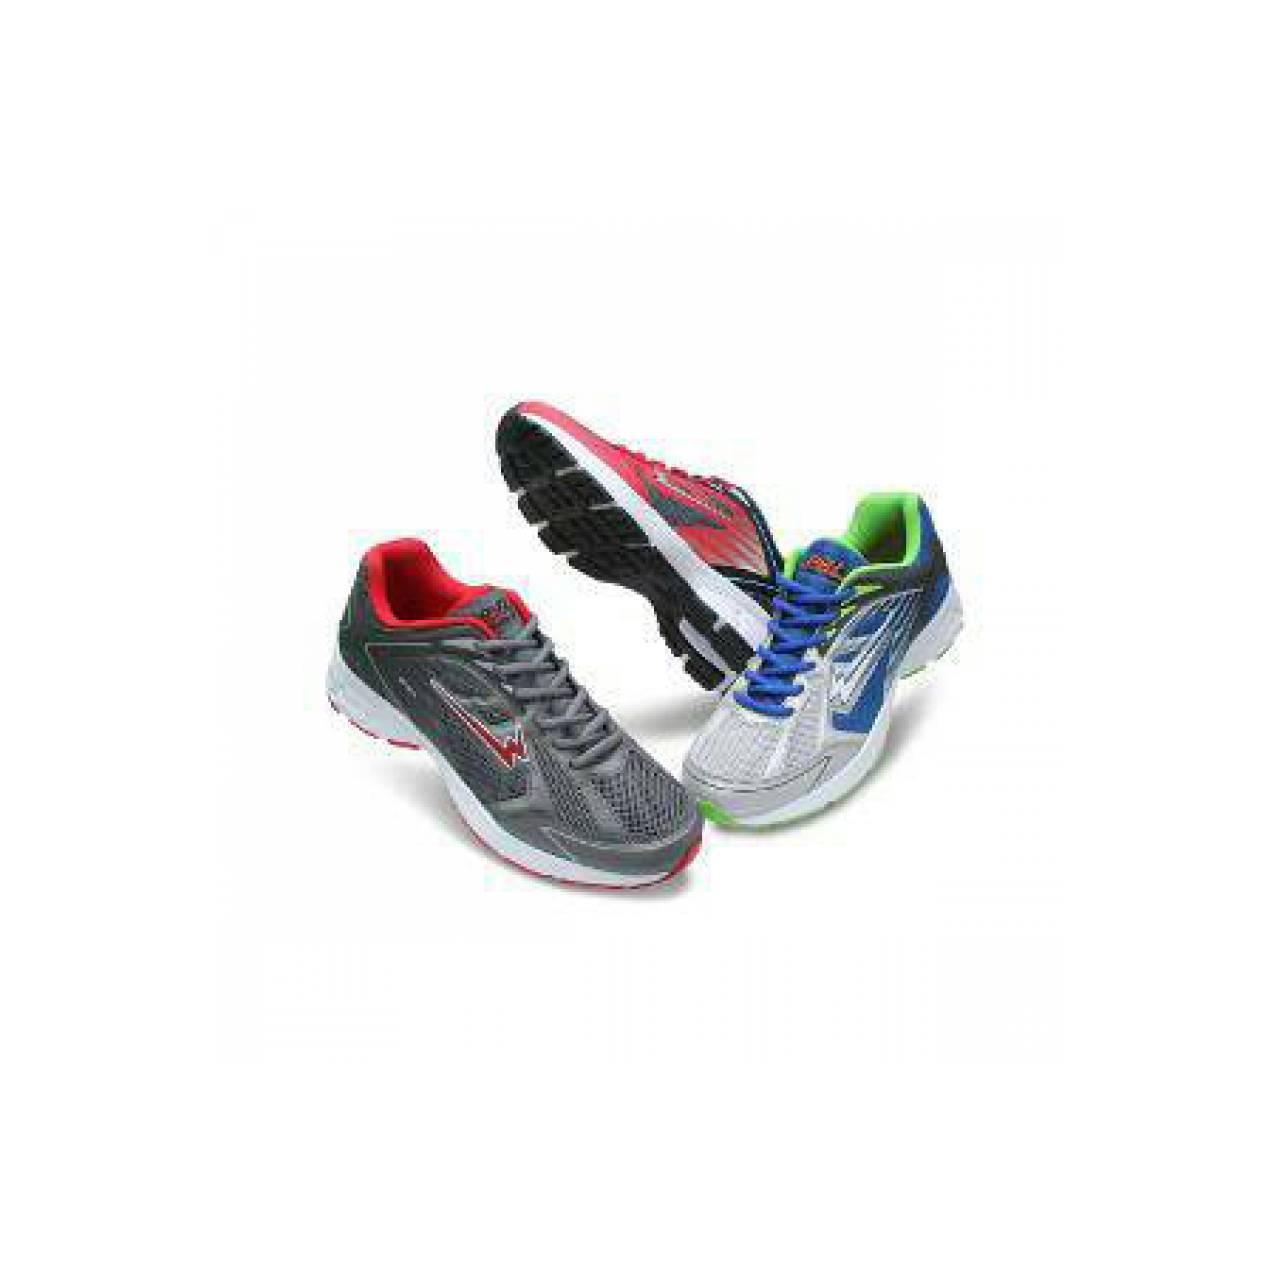 Sepatu Running EAGLE Coug / volley volly asics mizuno professional